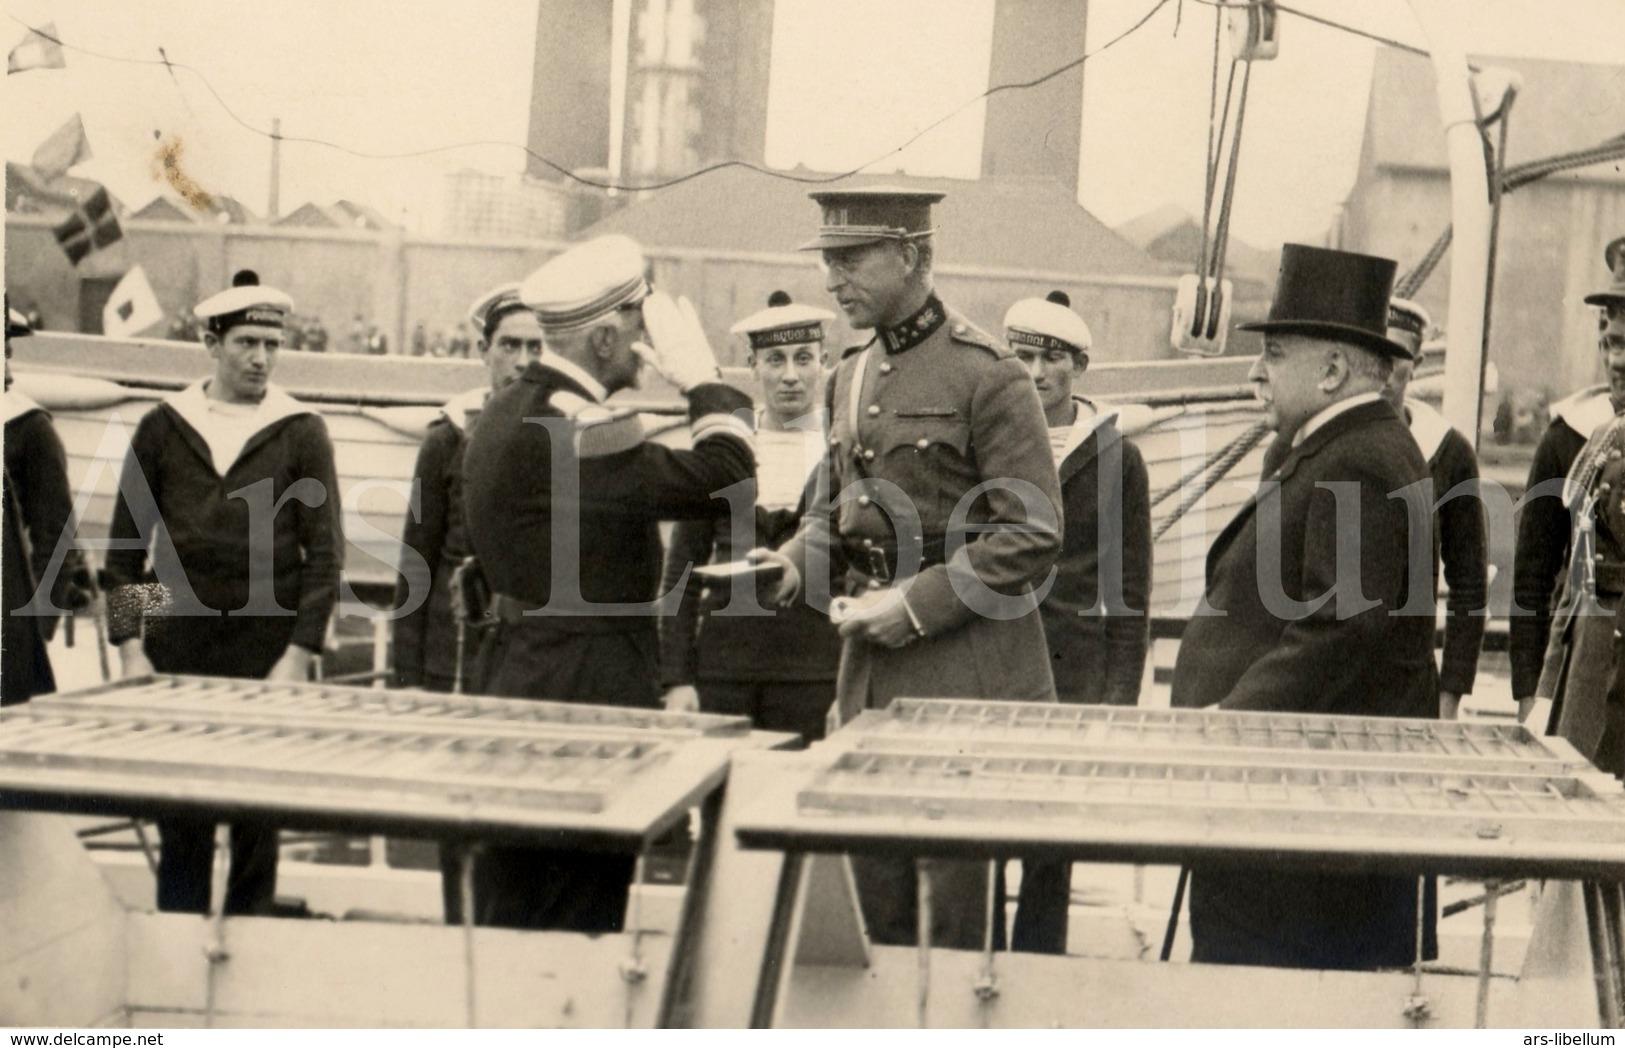 Postcard / ROYALTY / Belgique / Roi Albert I / Koning Albert I / L'explorateur Jean-Baptiste Charcot / 1926 - Célébrités